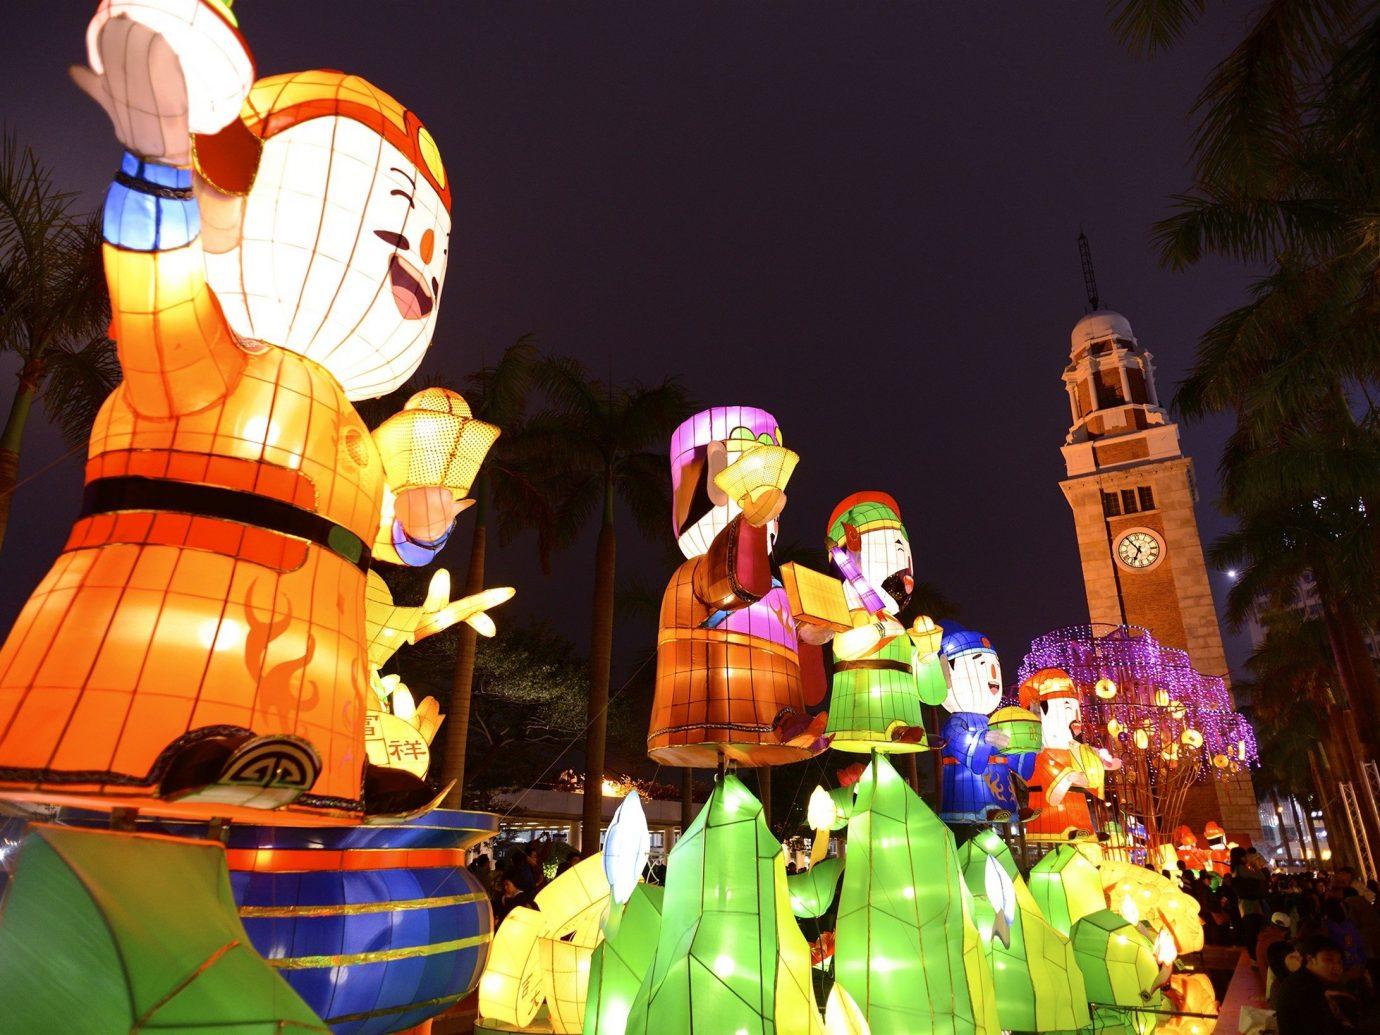 Trip Ideas color night amusement park carnival Resort festival colorful colored